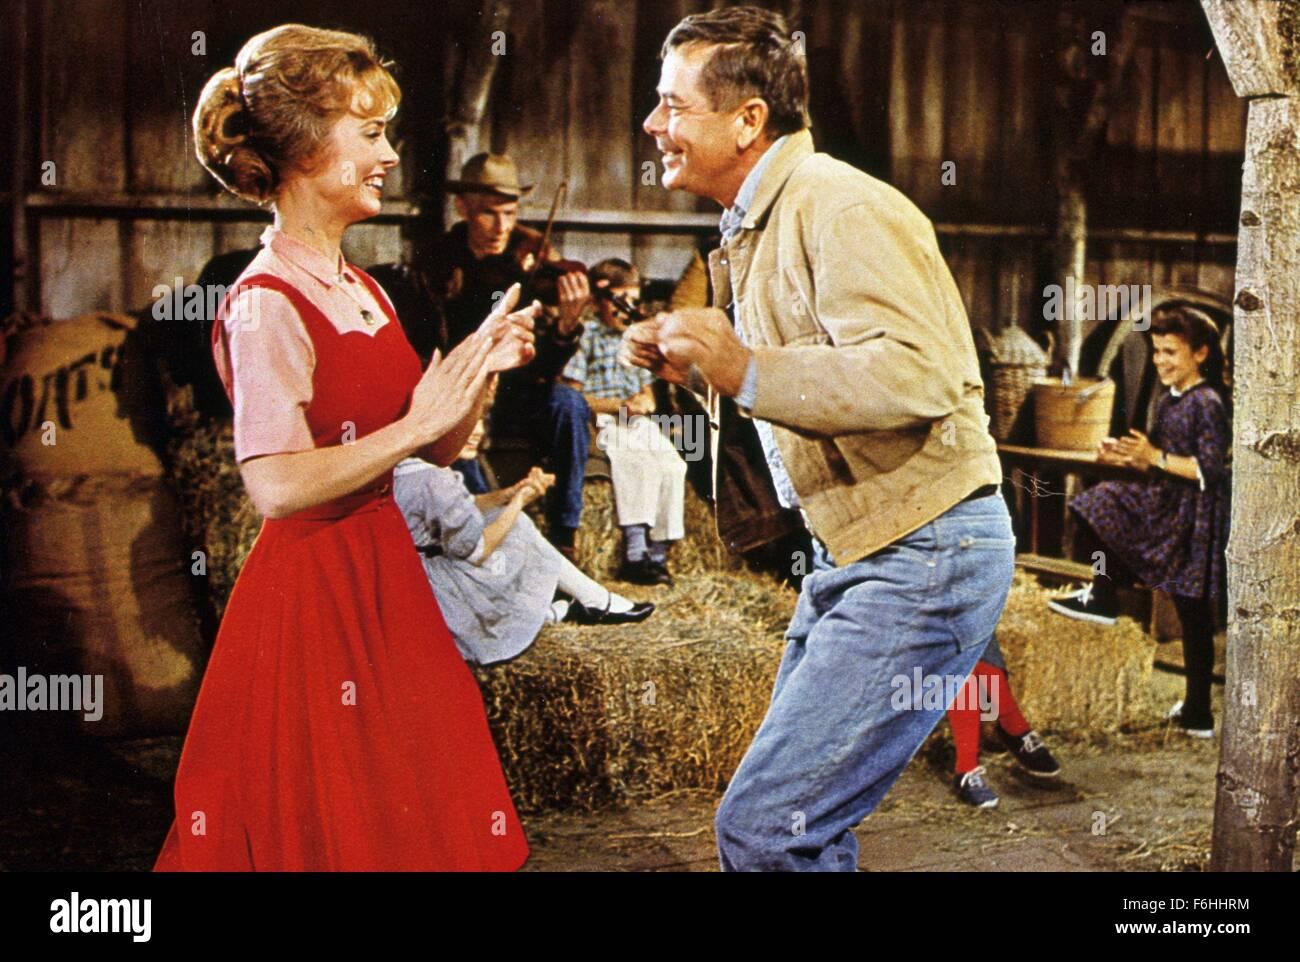 1965, Film Title: ROUNDERS, Director: BURT KENNEDY, Studio: MGM, Pictured: GLENN FORD, JOAN FREEMAN. (Credit Image: - Stock Image